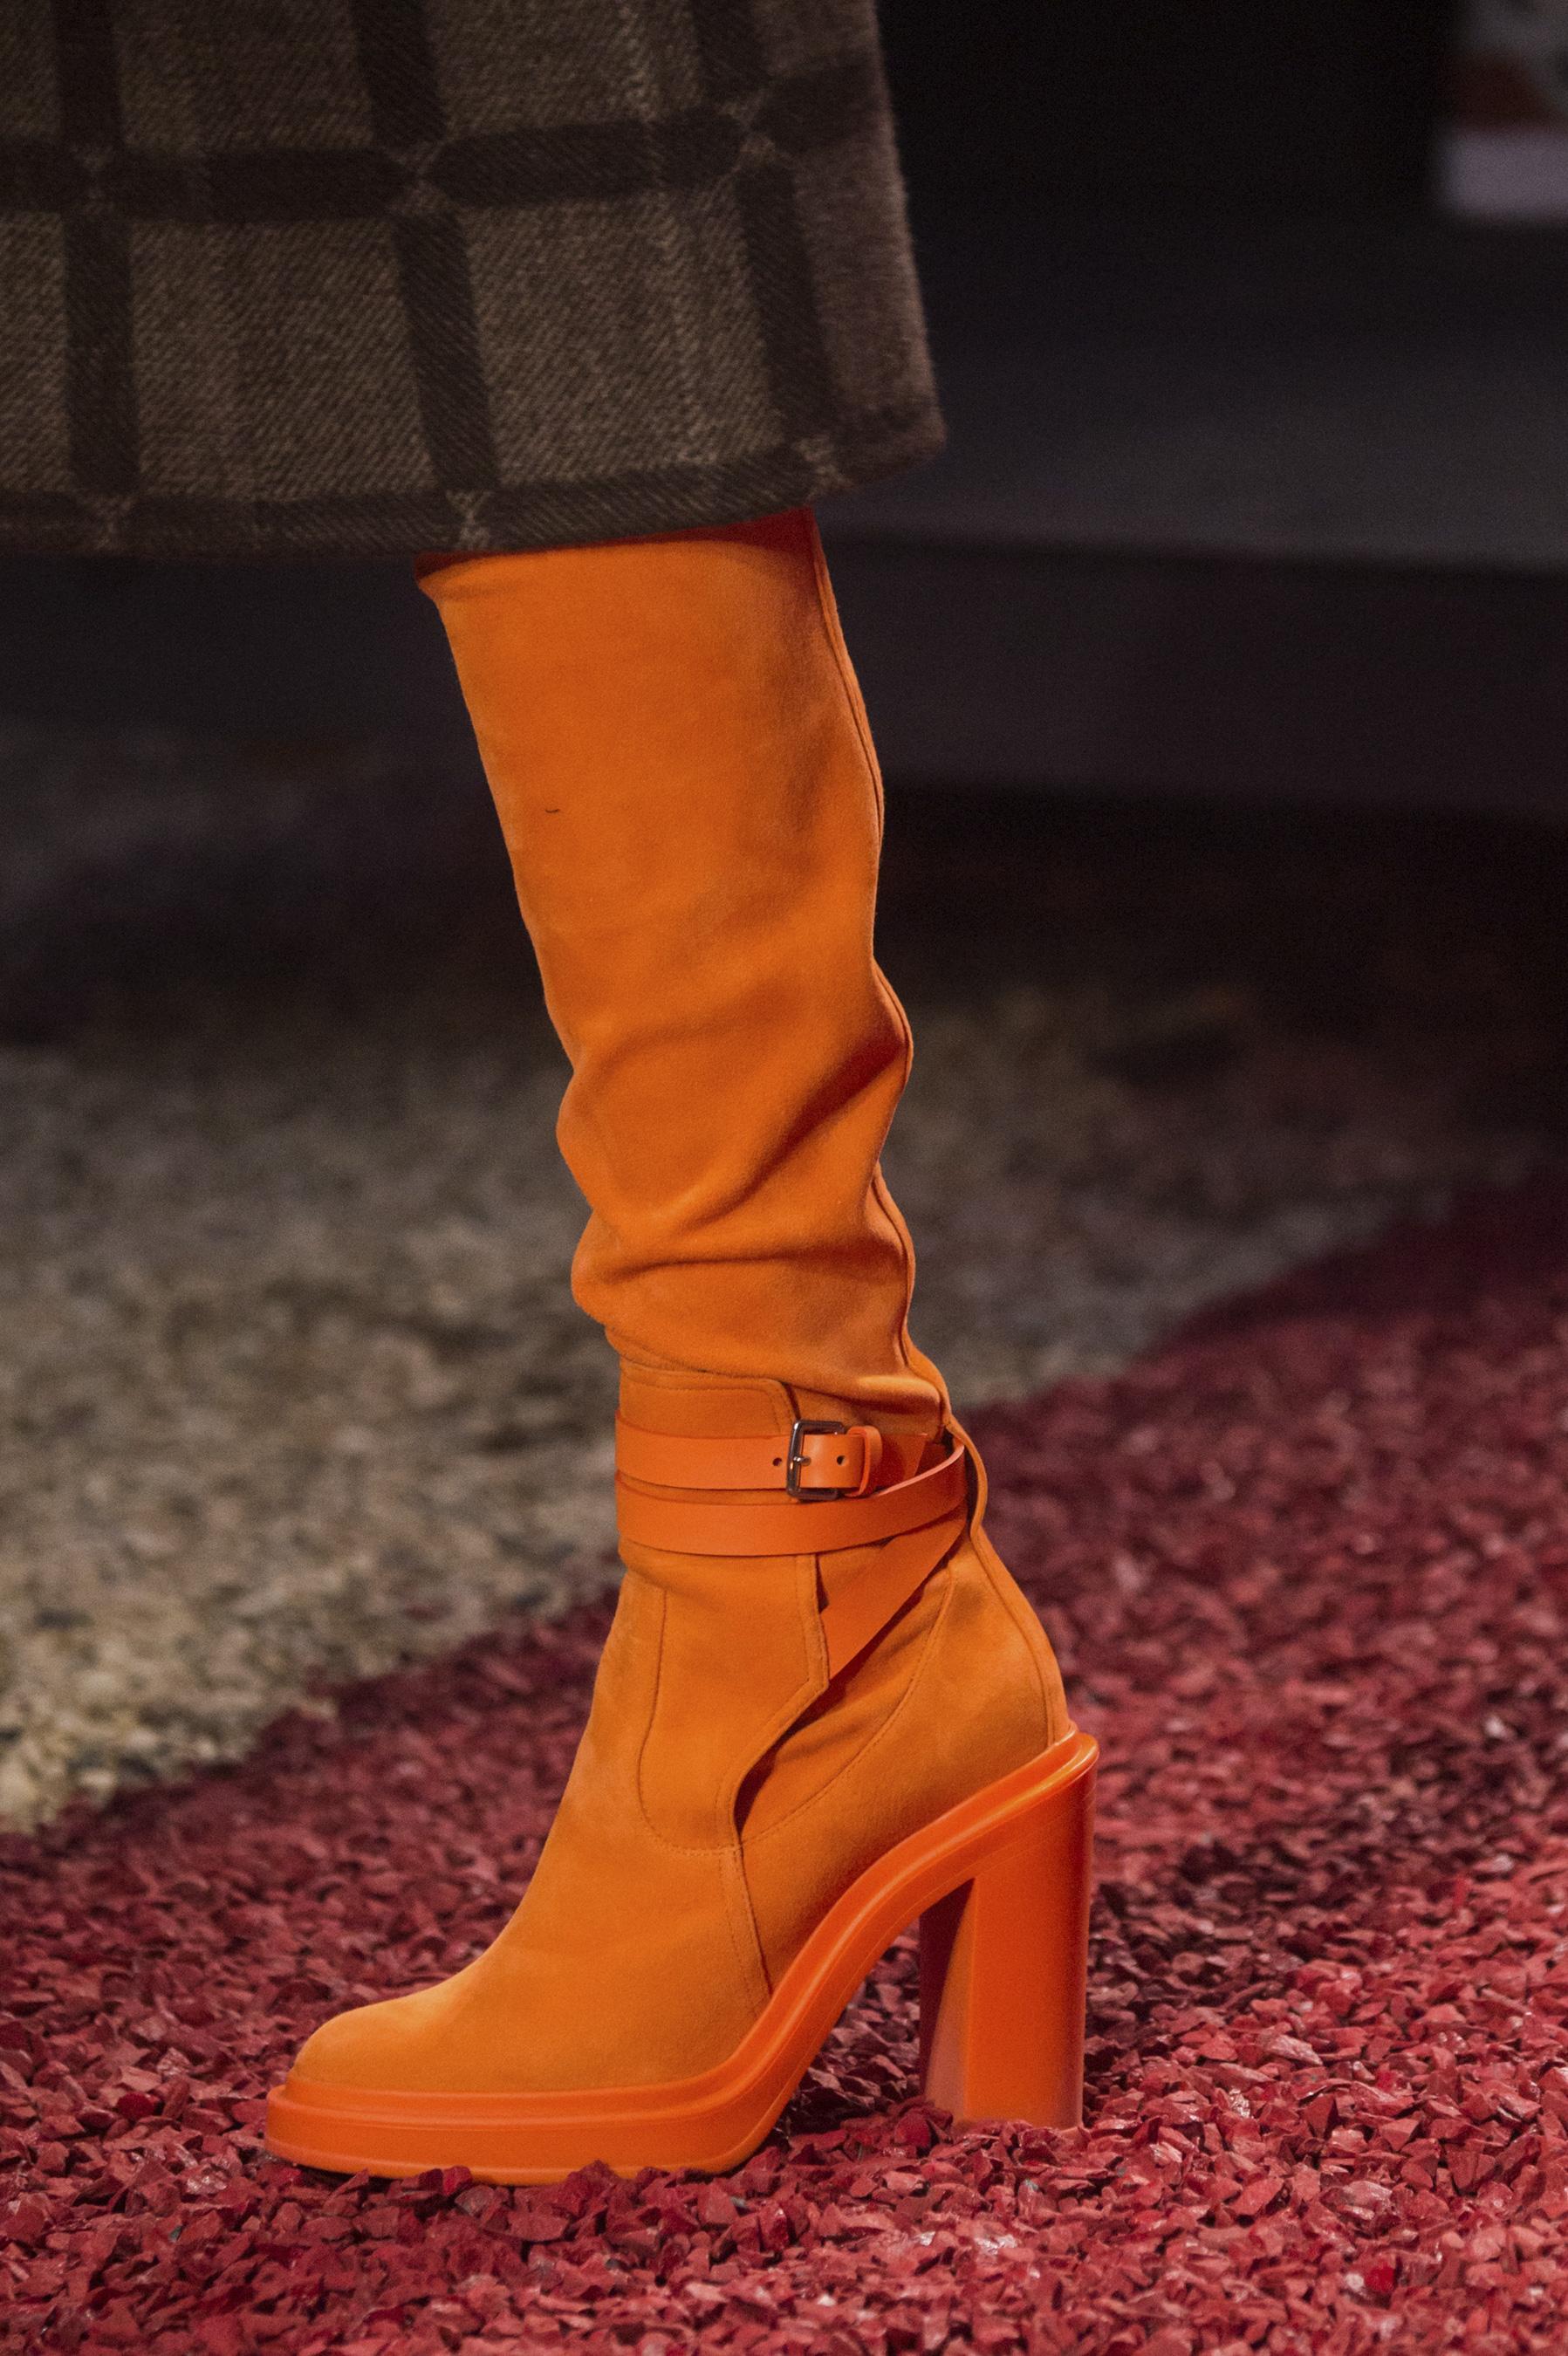 Défilé Hermès automne-hiver 2018-2019 Prêt-à-porter - Madame Figaro 3cd96327cb9